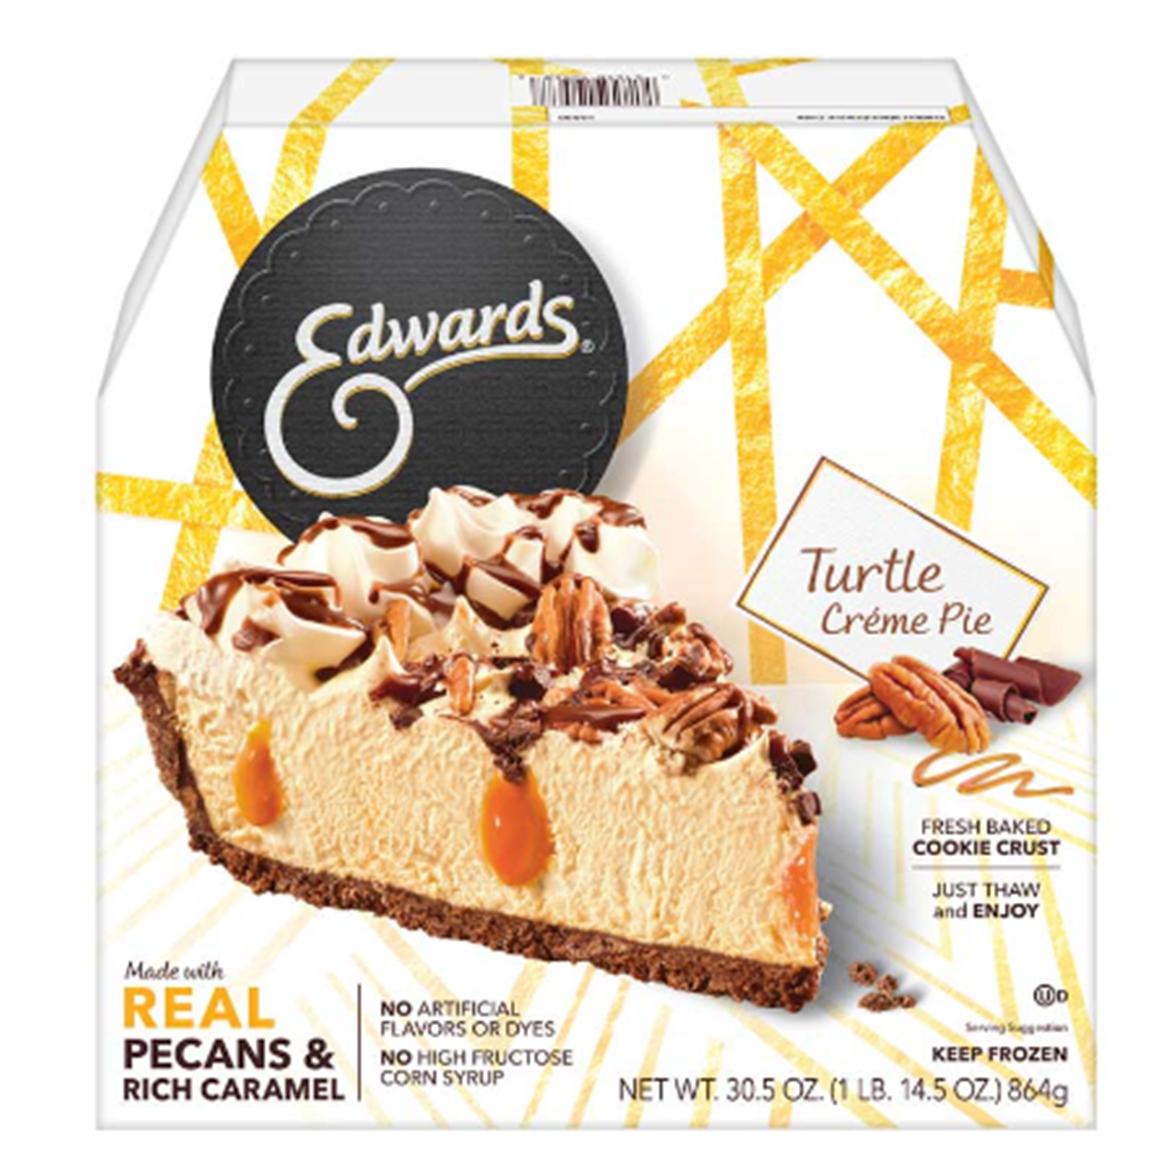 Target – Edwards Frozen Pies $4.00 each After BOGO 50% Deal